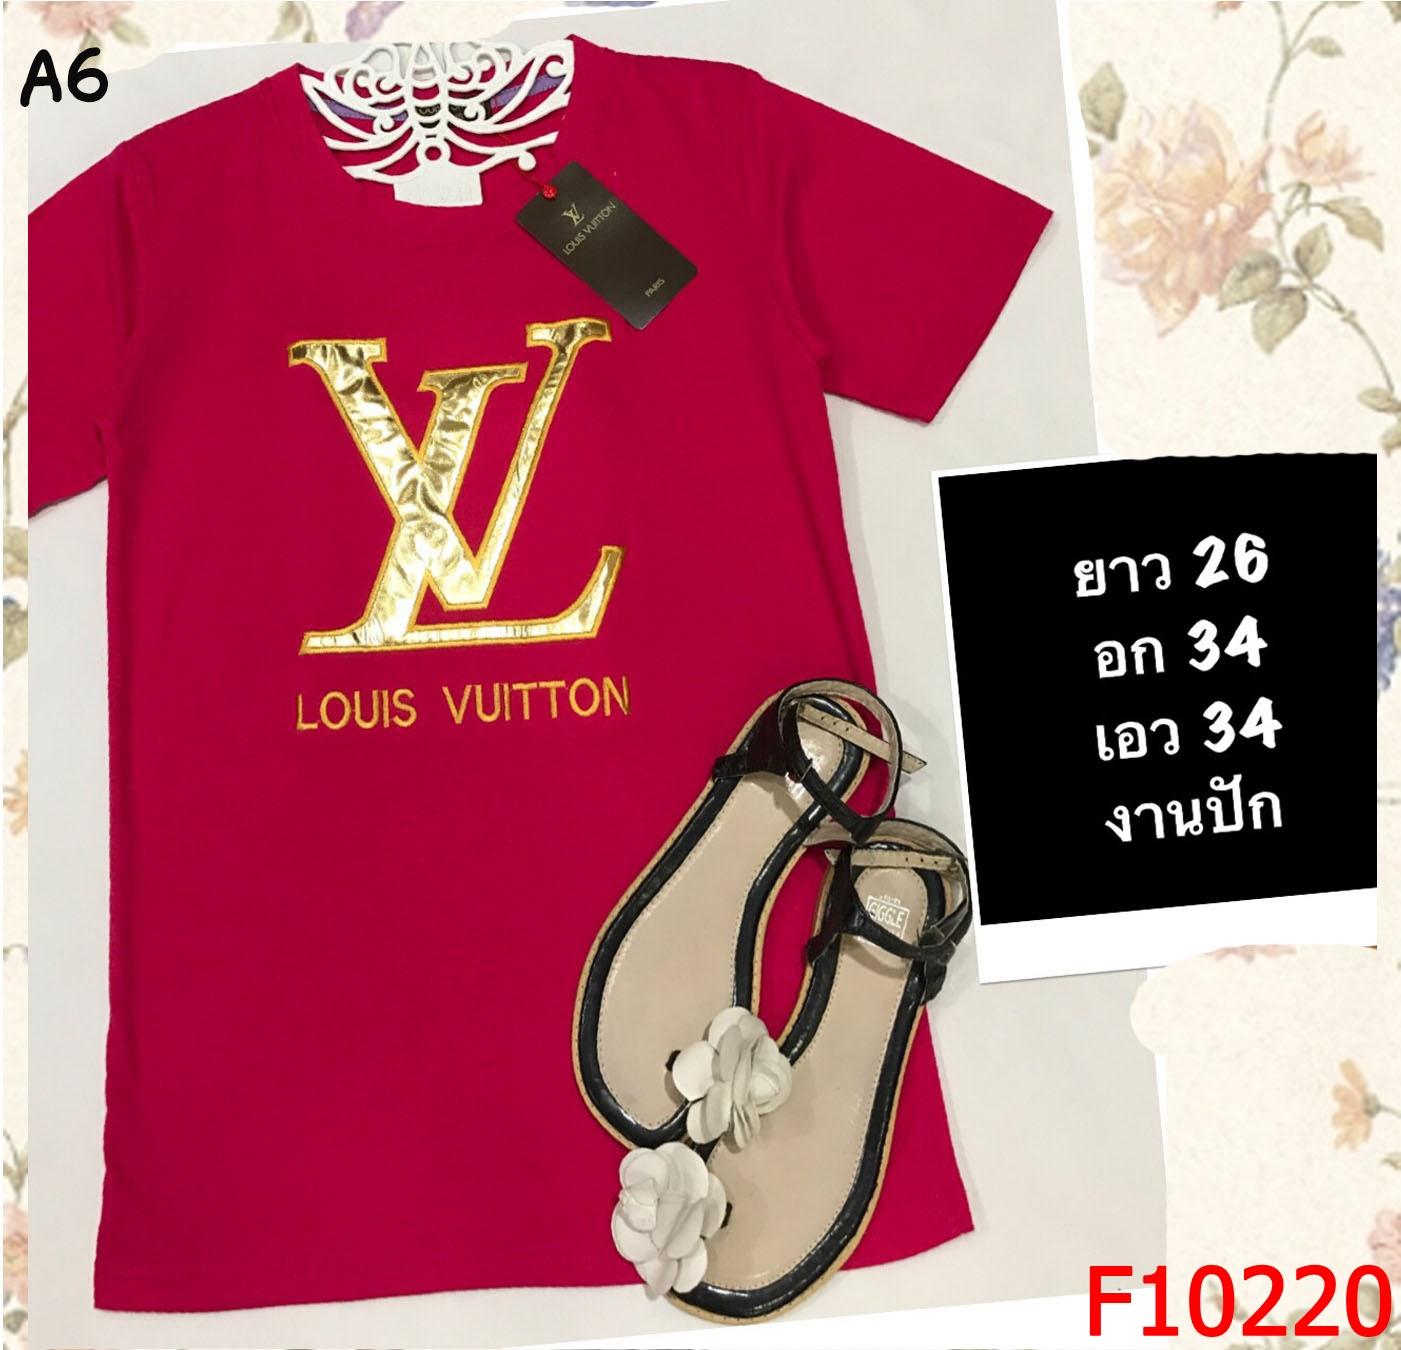 F10220 เสื้อยืด คอกลม สีชมพูเข้ม งานปัก ลาย LV (หลุยส์)